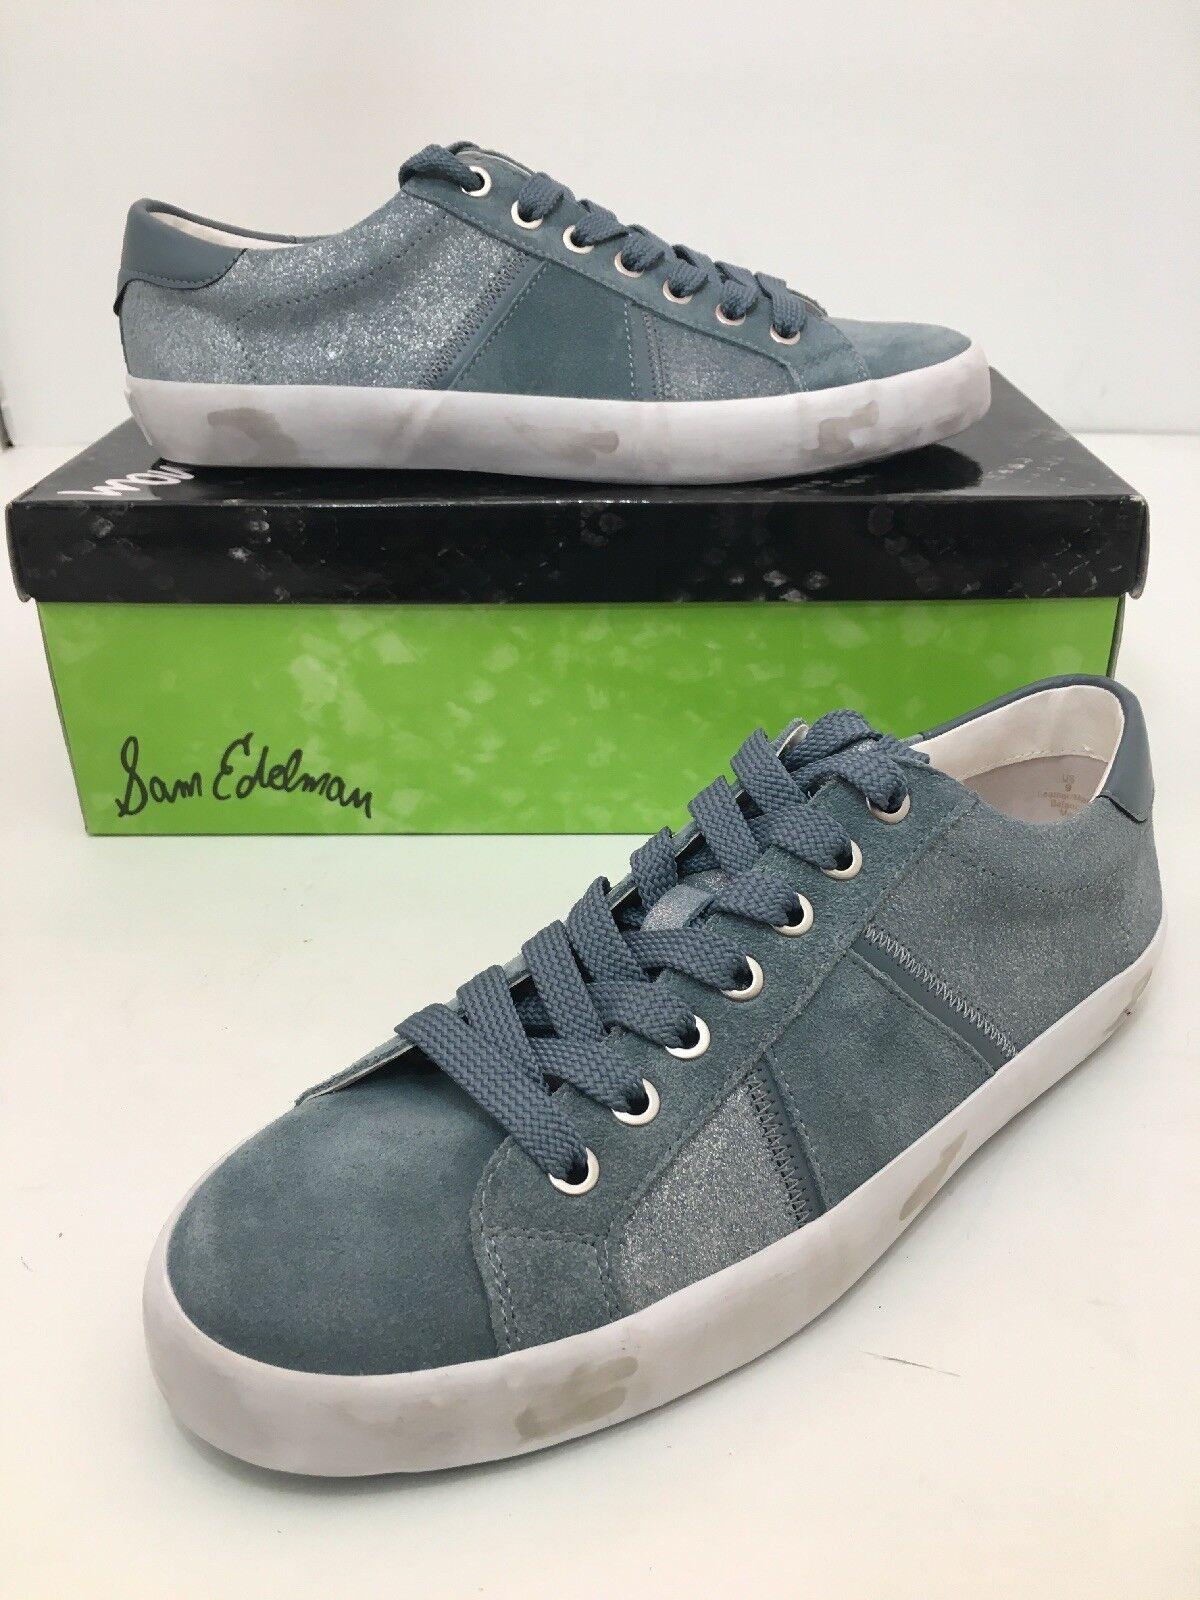 Sam Edelman Baylee Women's Sneakers Flats SIZE 9 M bluee Shadow Shimmer Suede